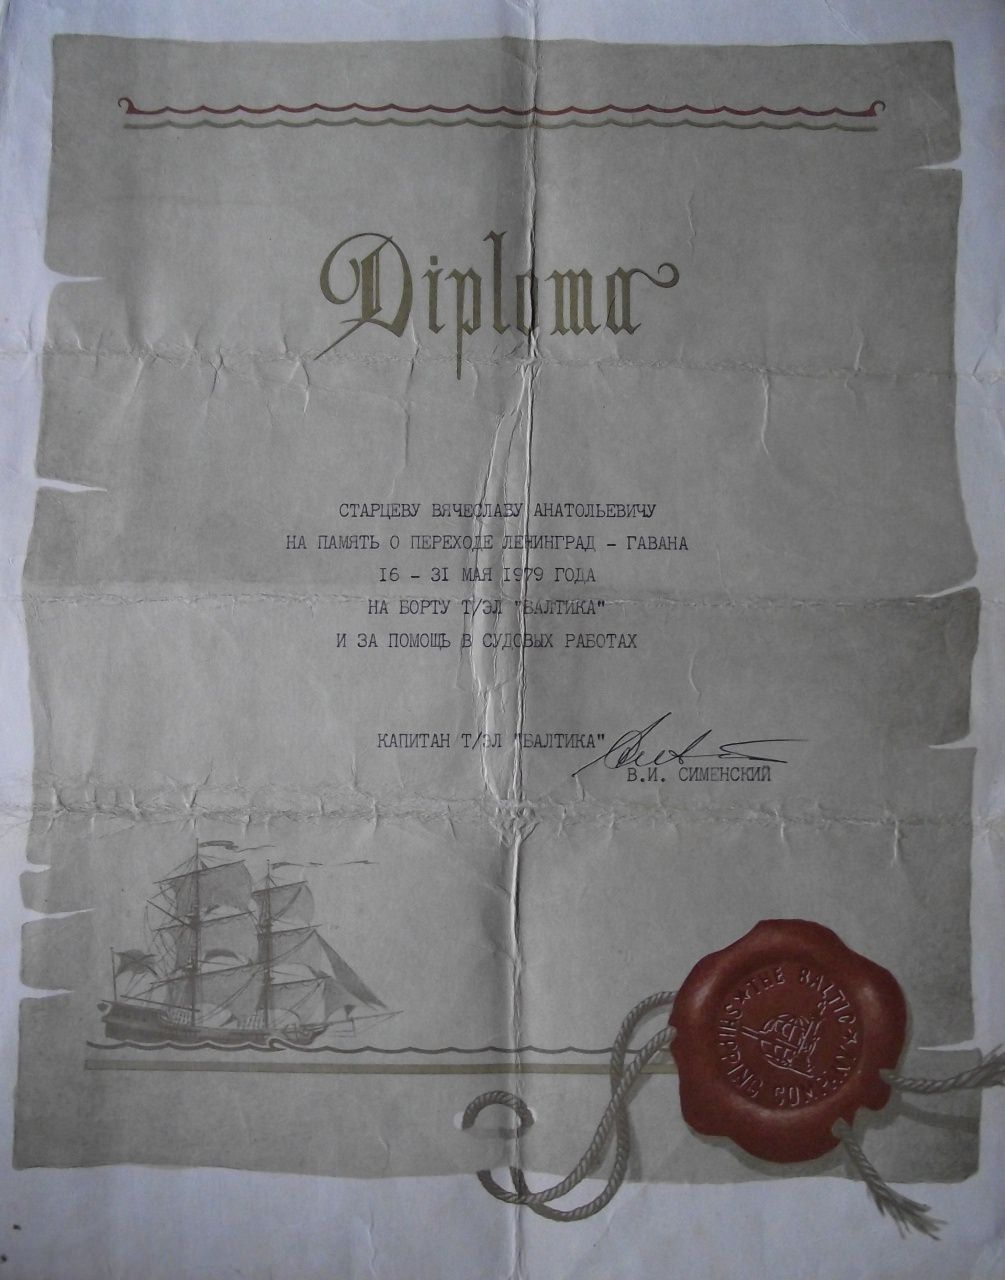 1979-05. Диплом на память о переходе Ленинград - Гавана. Теплоход Балтика